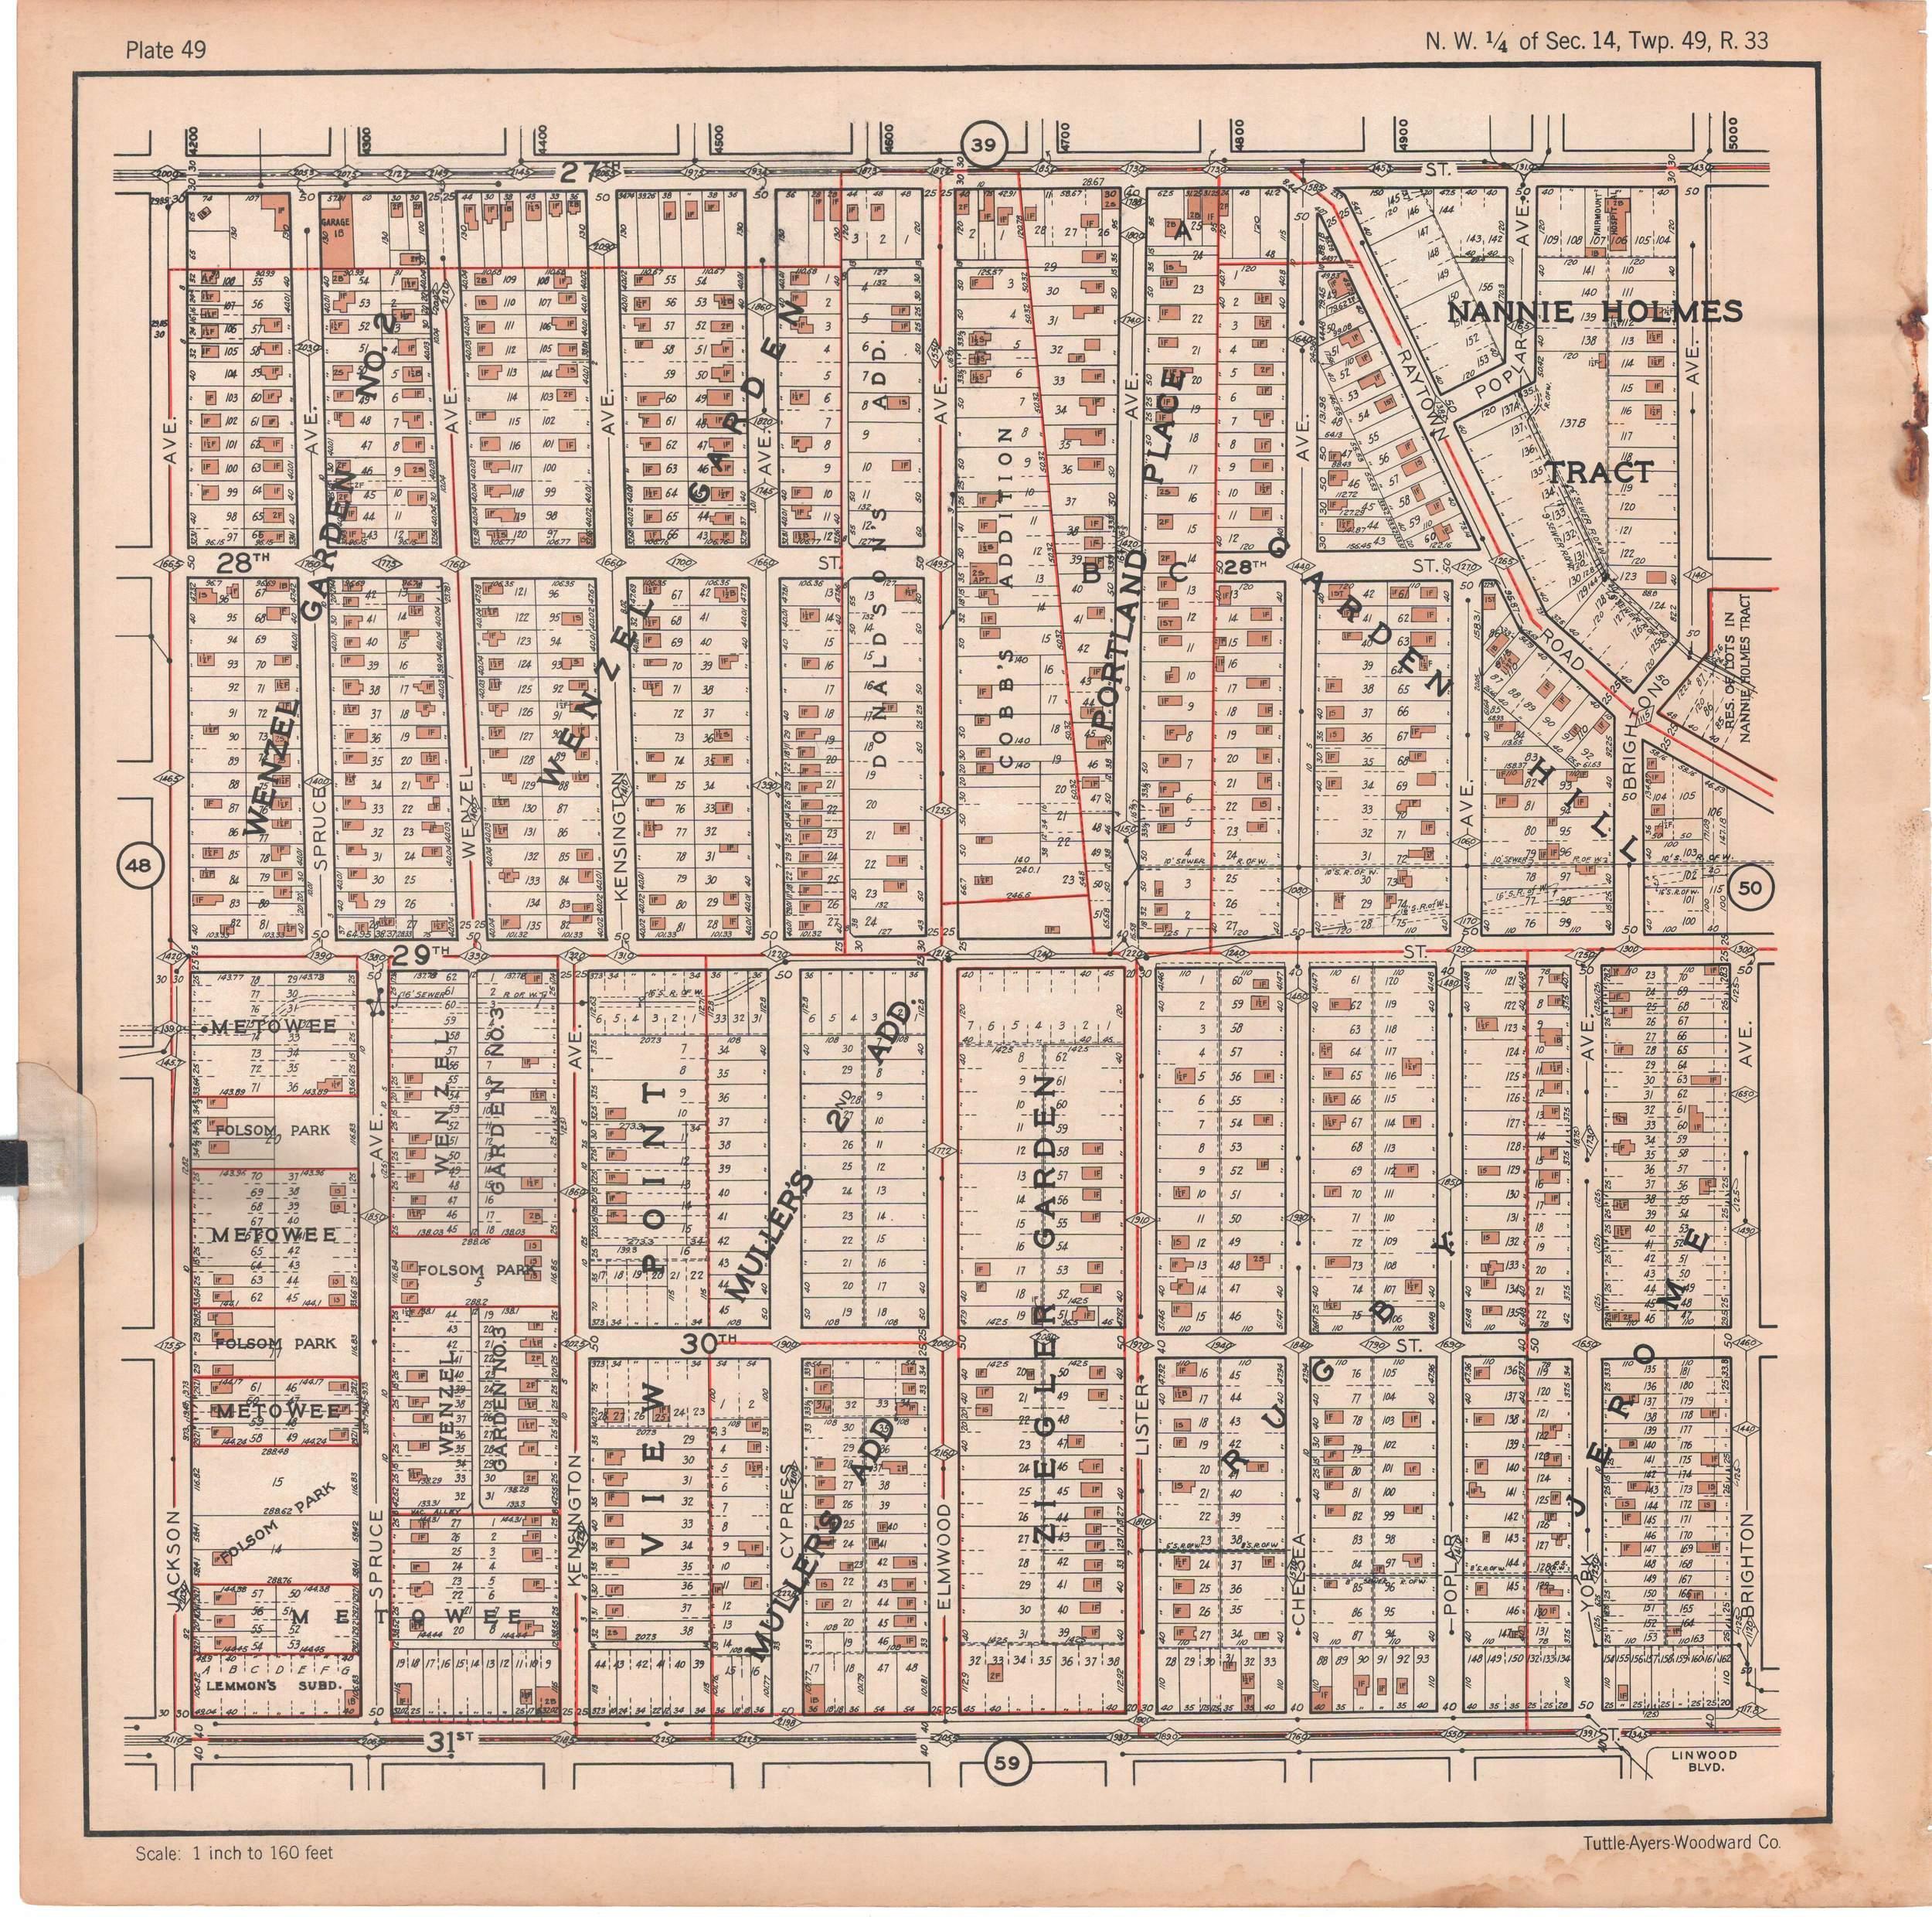 1925 TUTTLE_AYERS_Plate 49.JPG